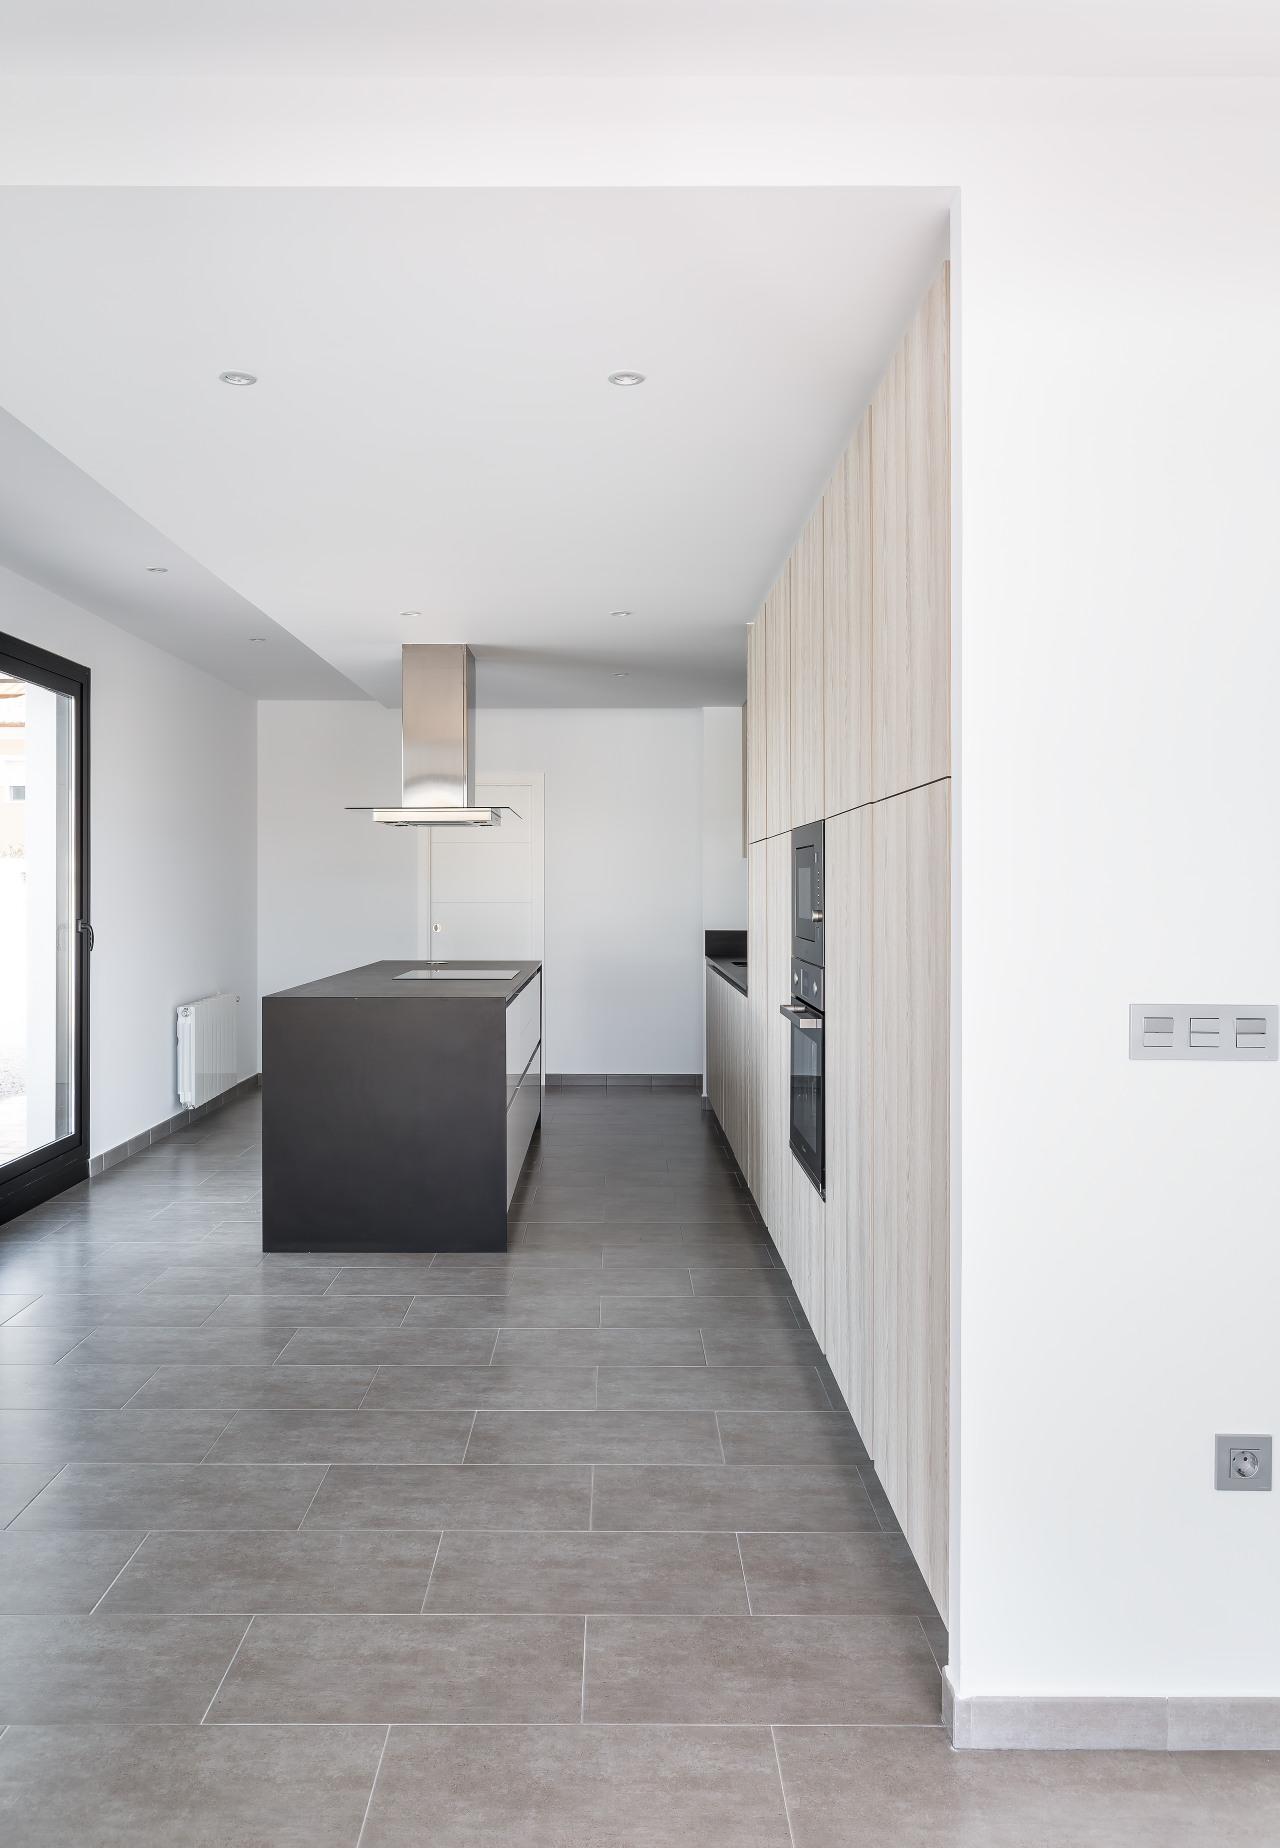 fotografia-arquitectura-valencia-german-cabo-viraje-vivienda-unifamiliar-calpe (28)